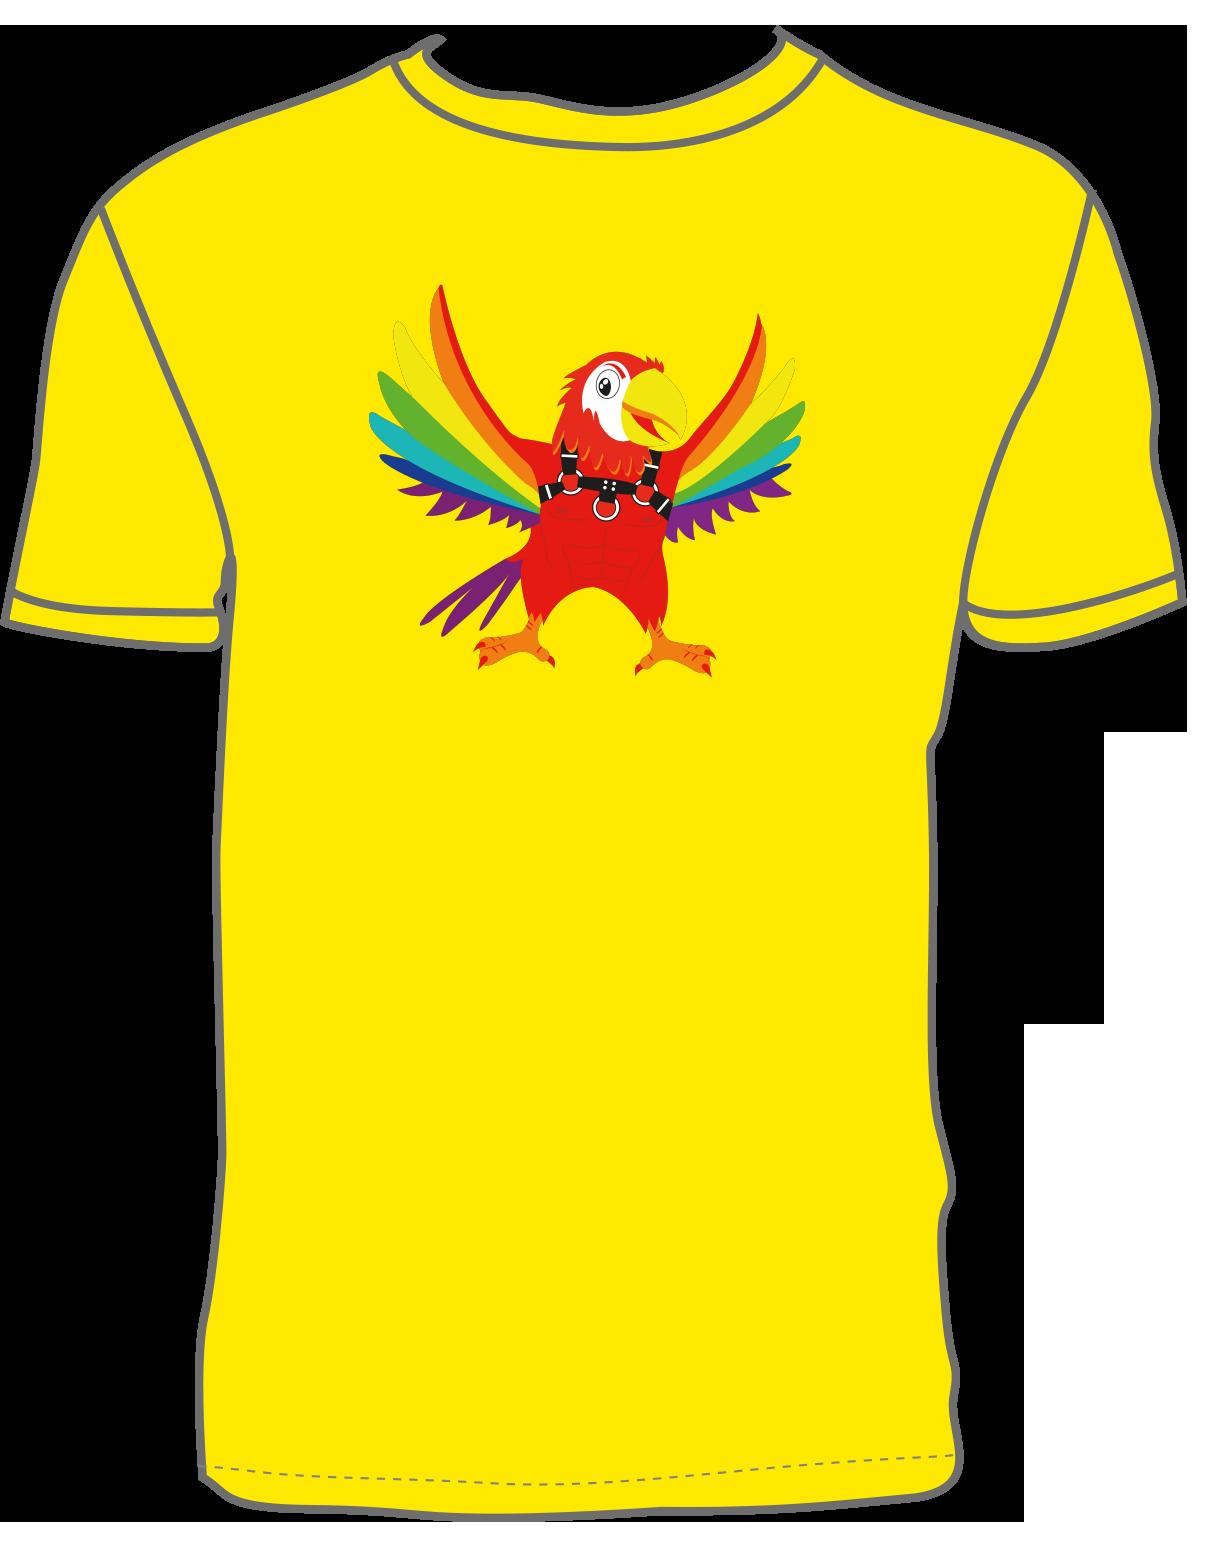 Coco Loco Coco Fetish T-shirt - Yellow